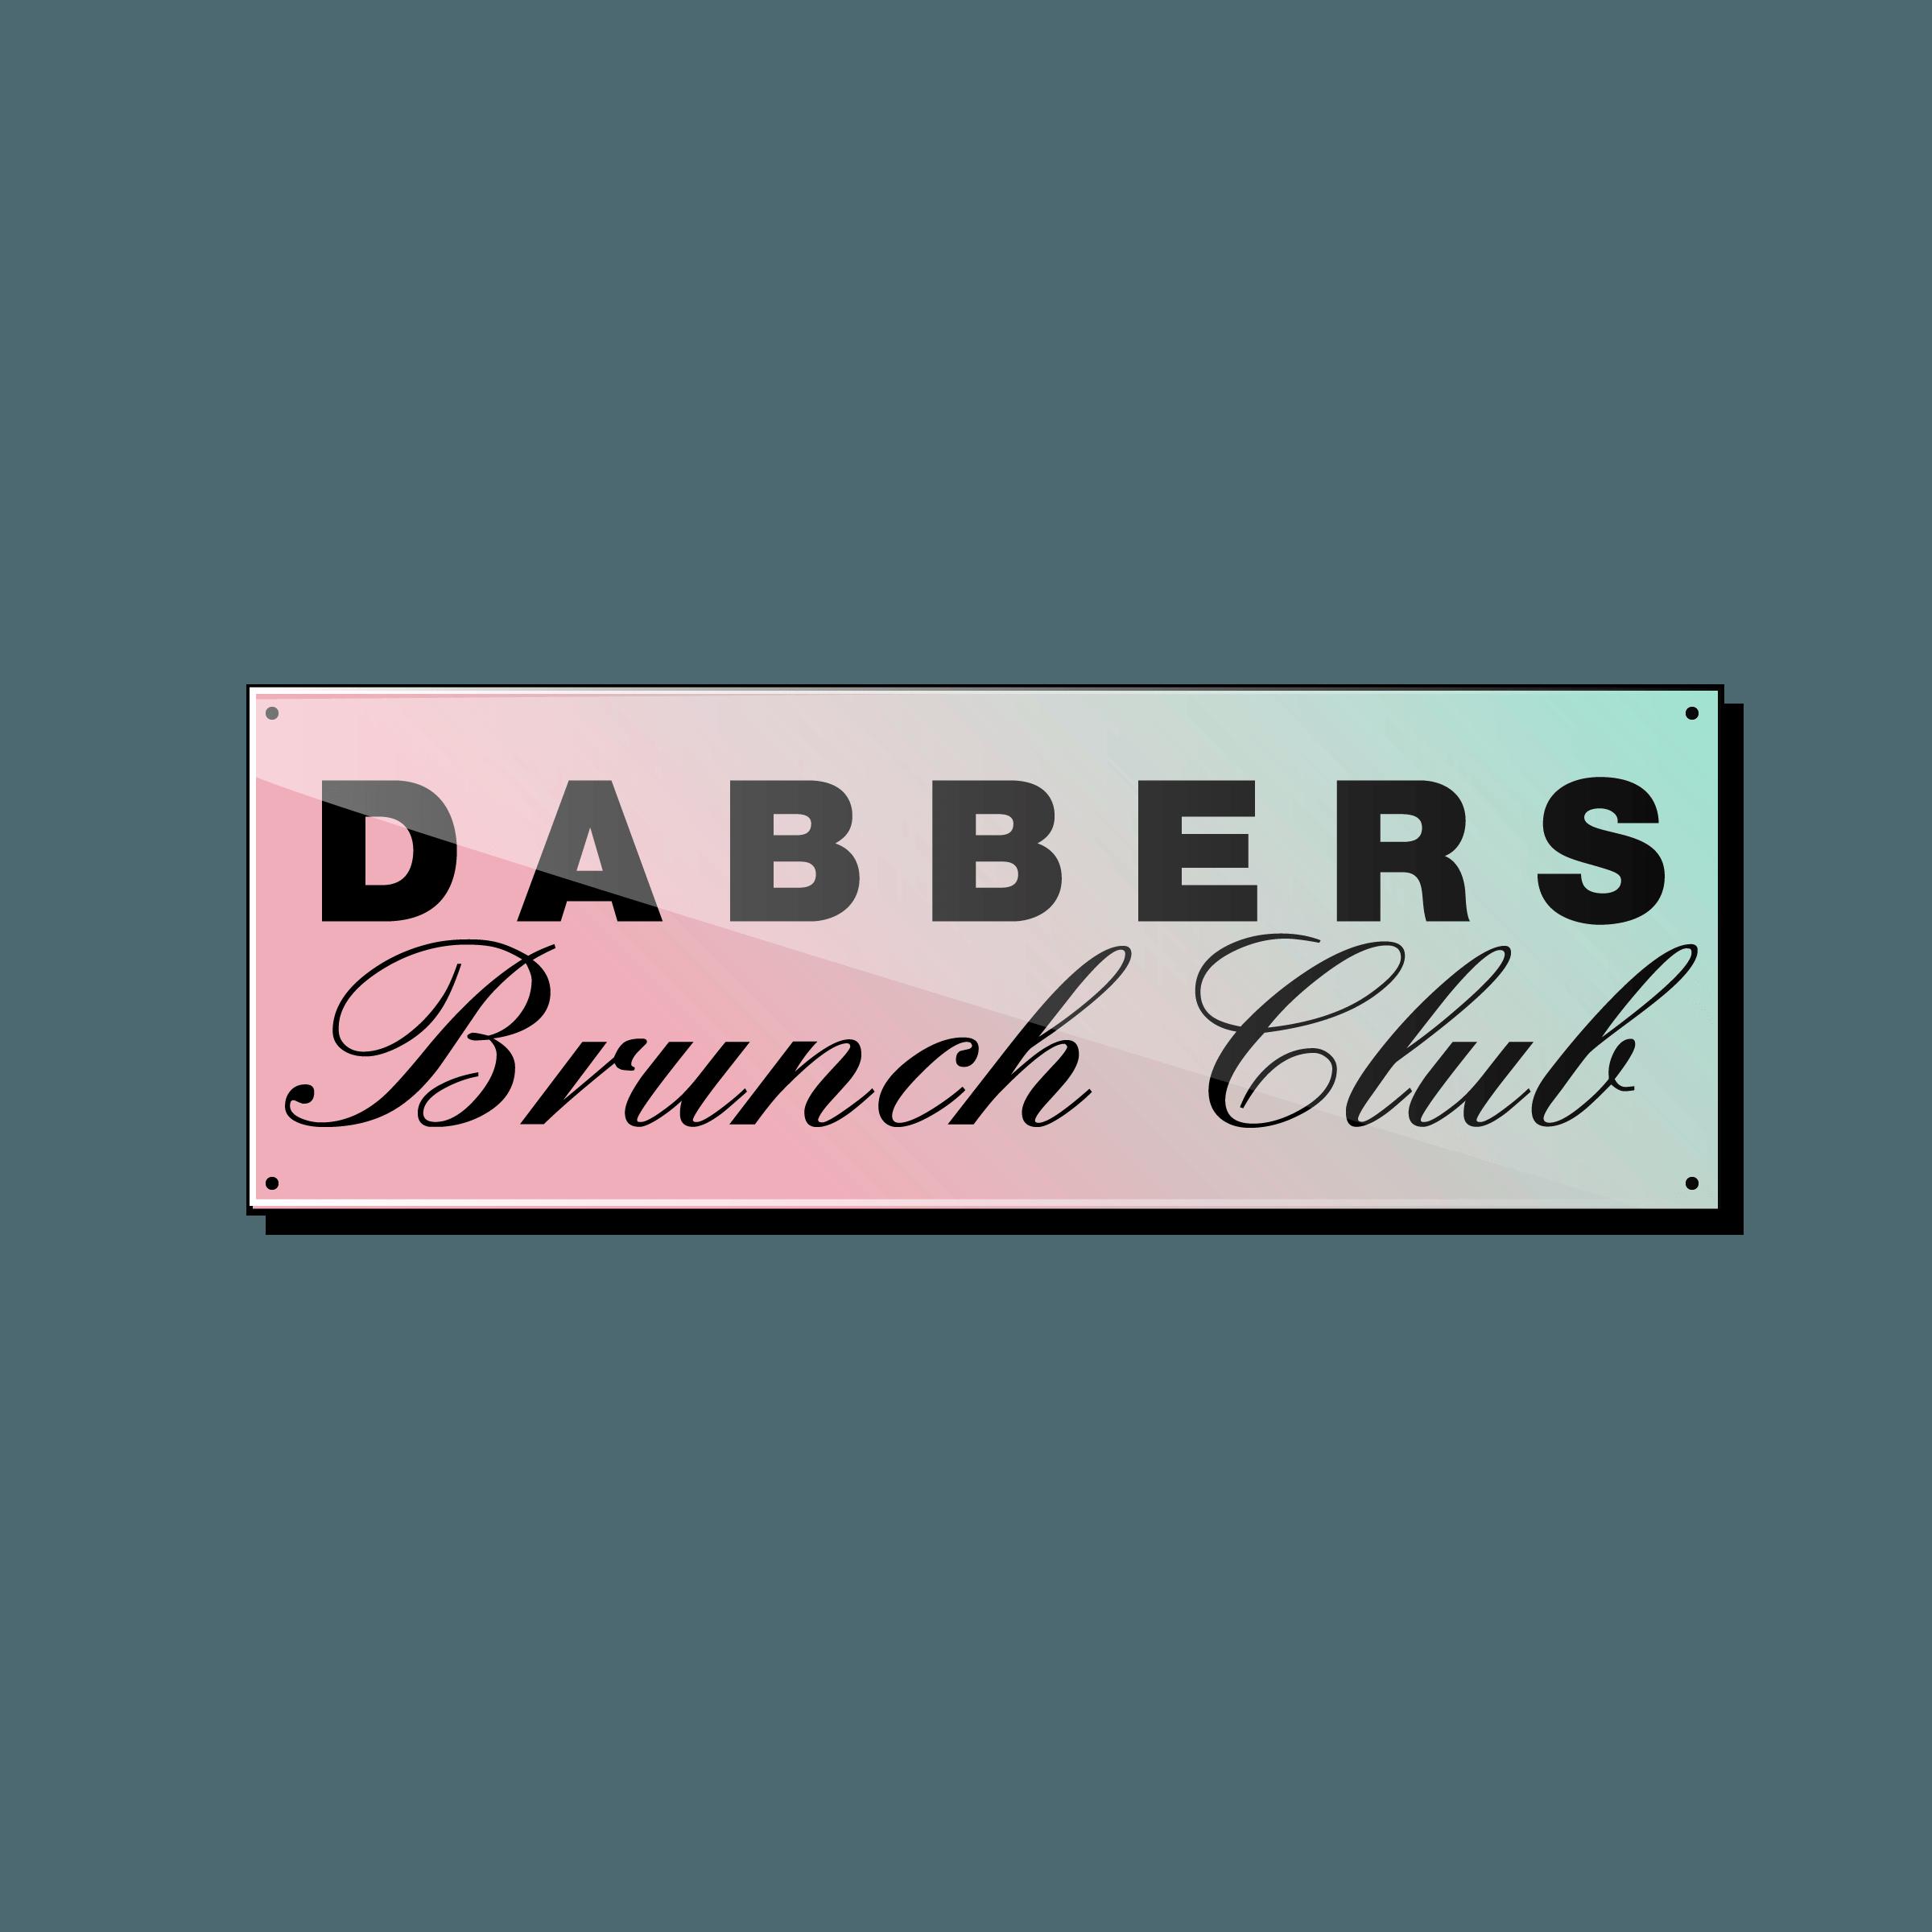 Dabbers Brunch Club Logo